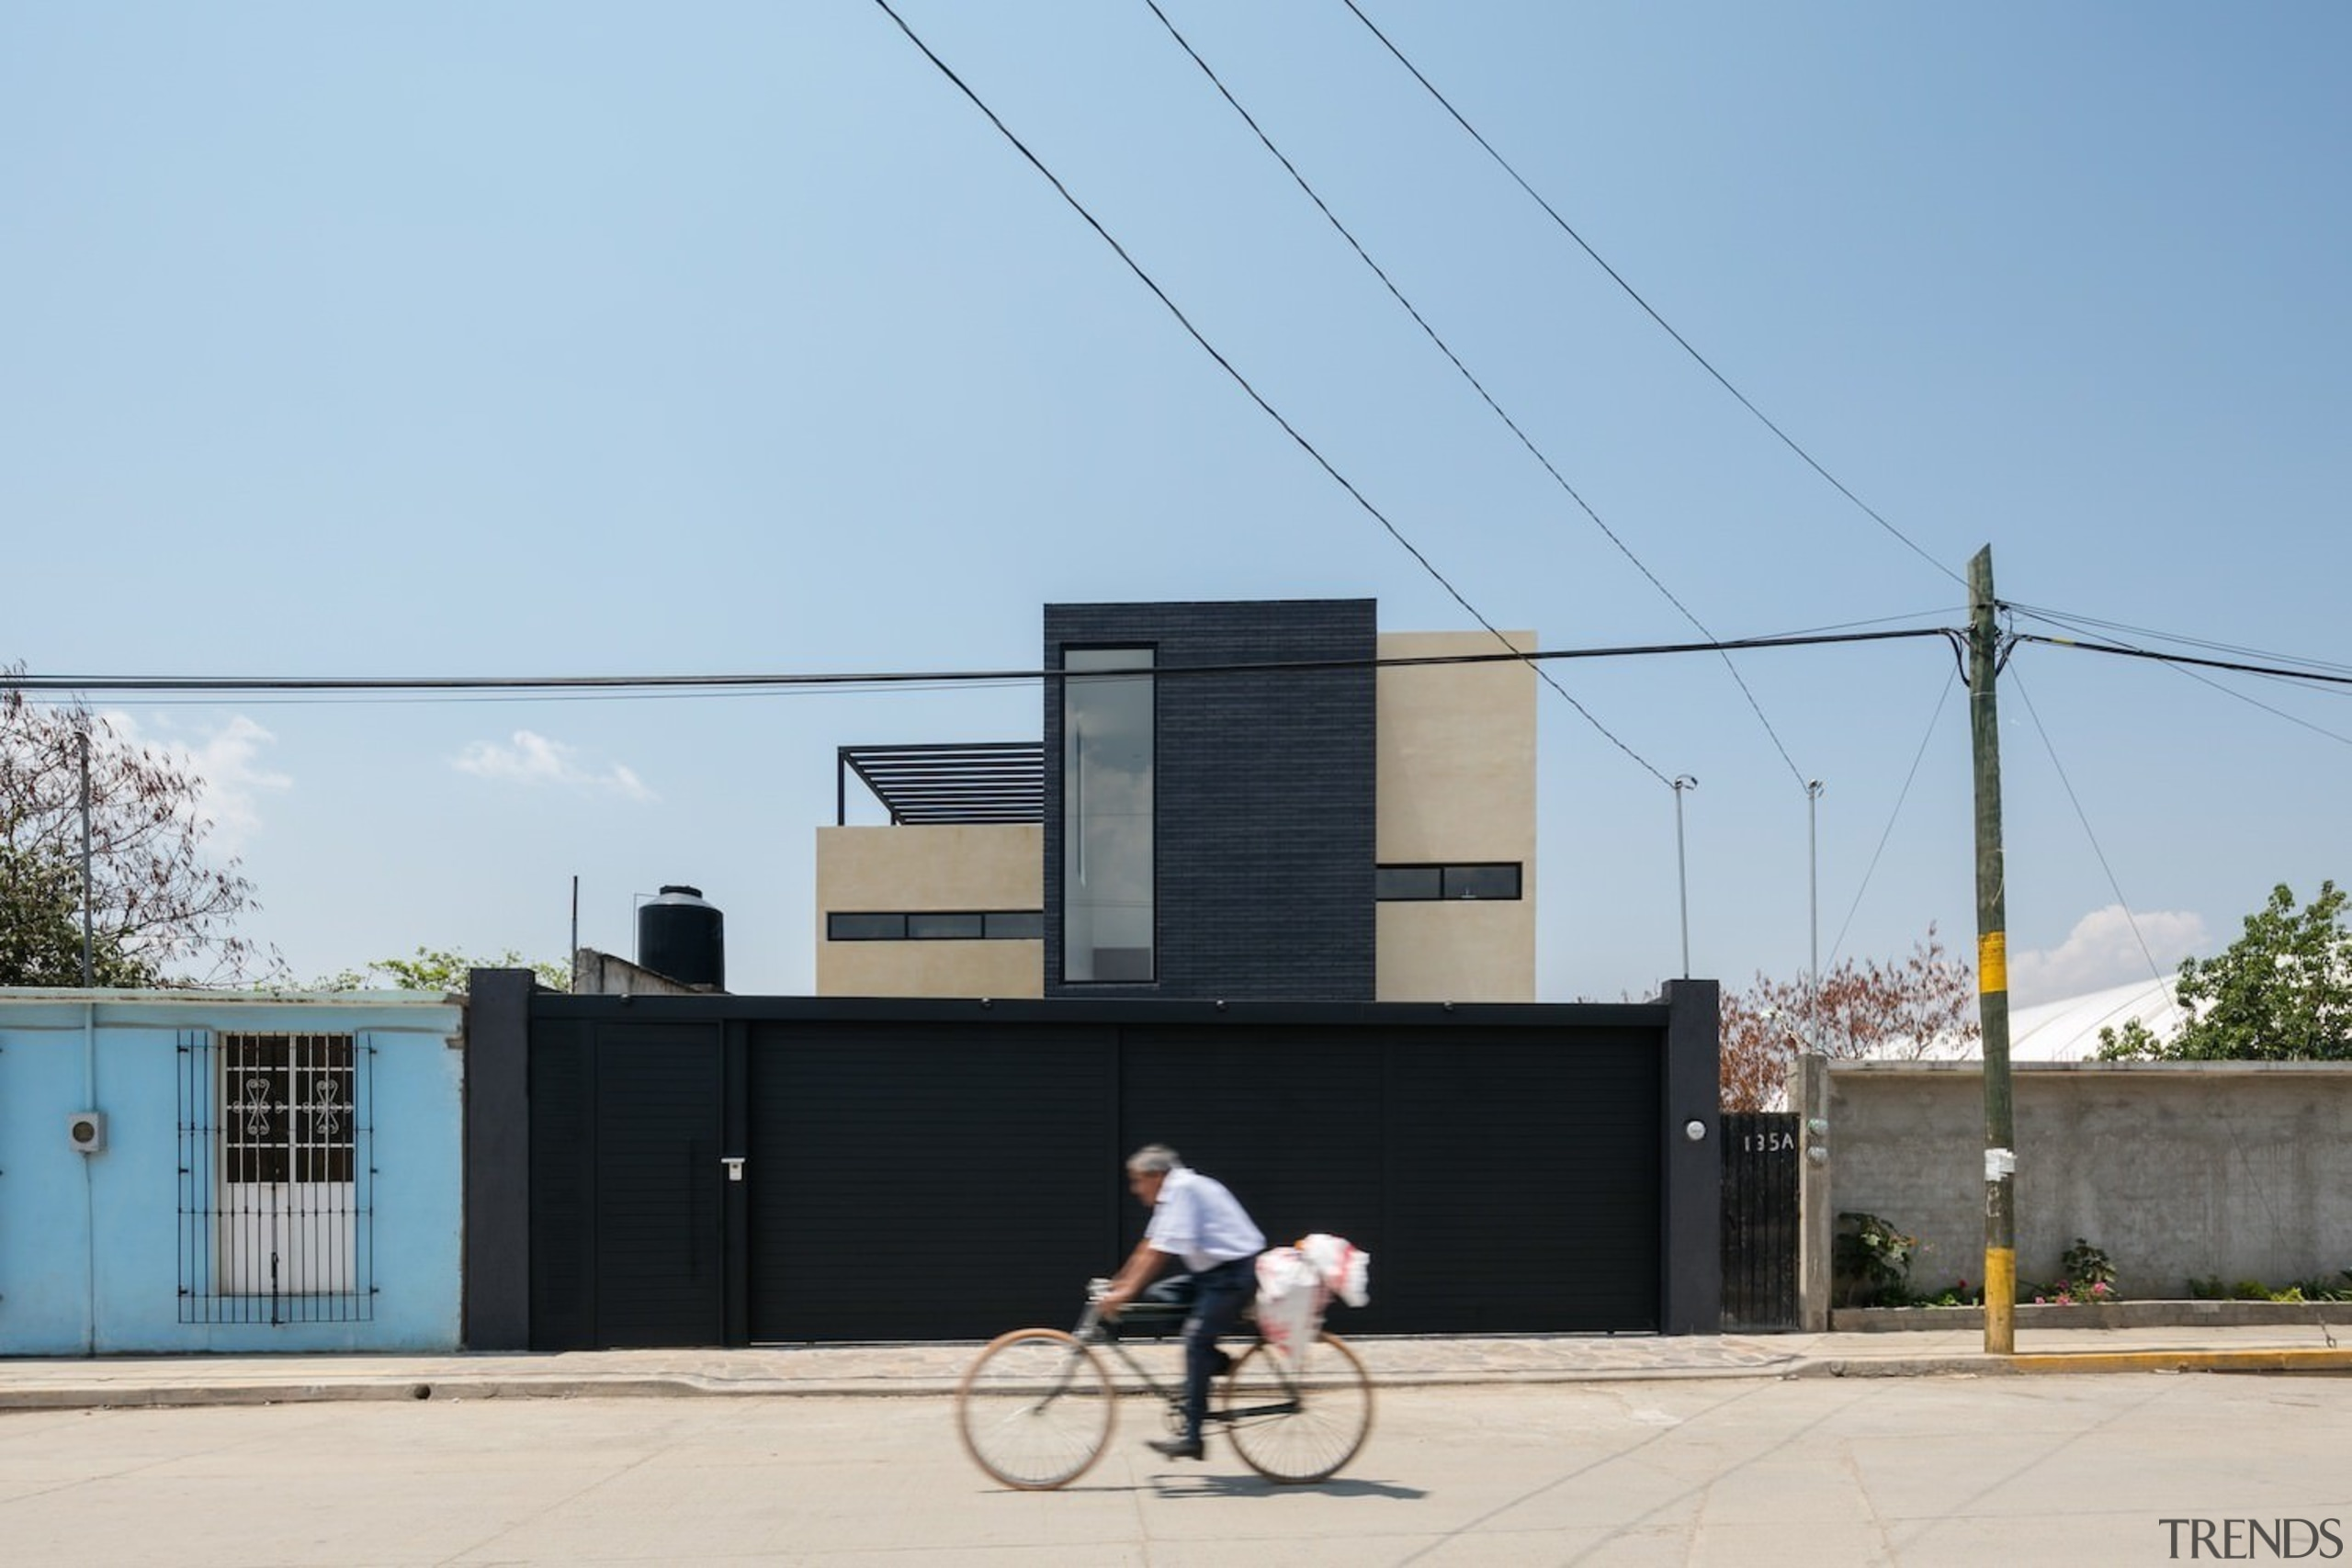 Architect: Espacio 18 ArquitecturaPhotography by Lorena Darquea architecture, building, house, sky, vehicle, teal